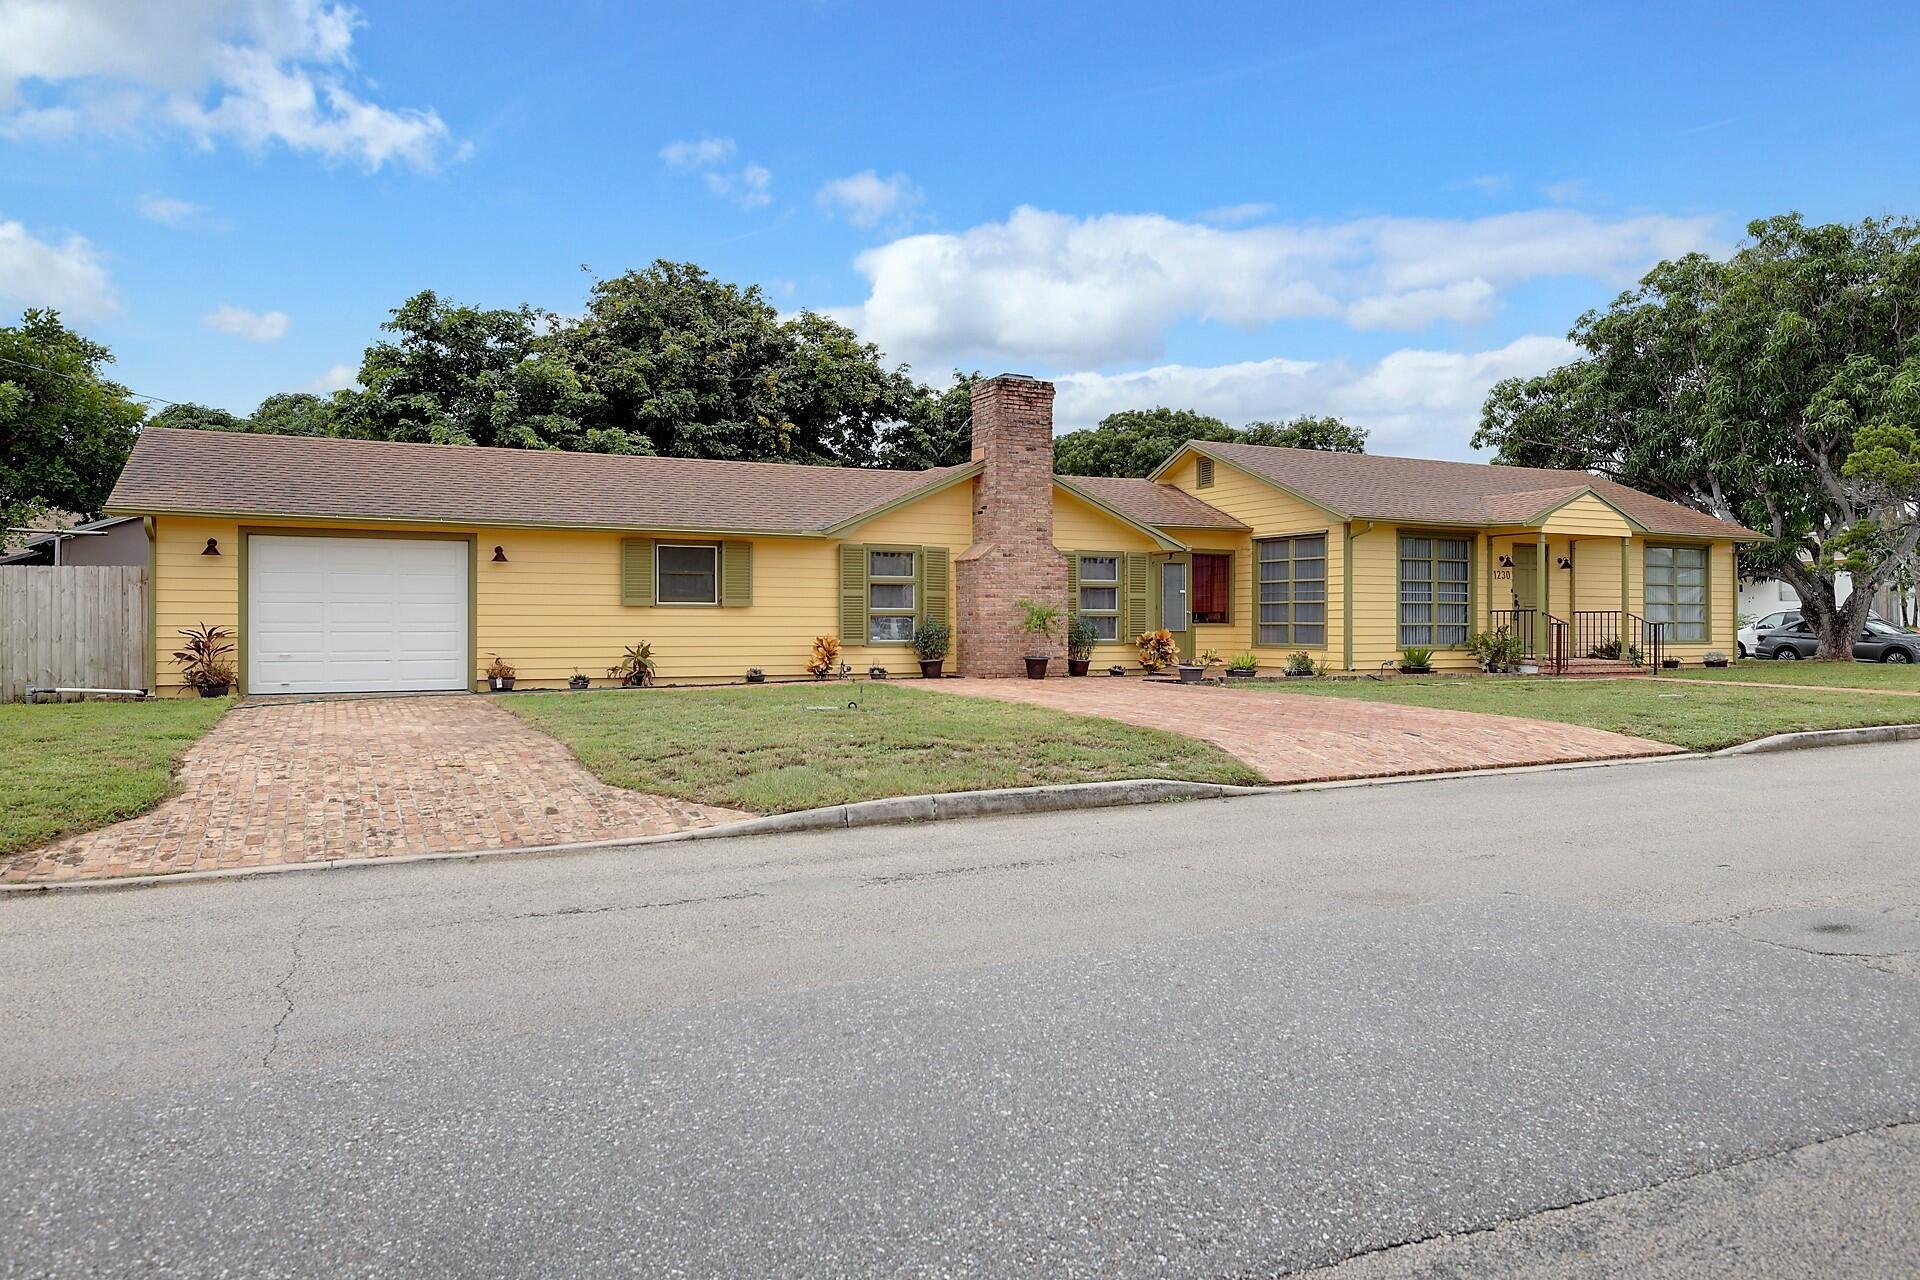 1230 N C Street, Lake Worth, FL 33460 - MLS#: RX-10745212